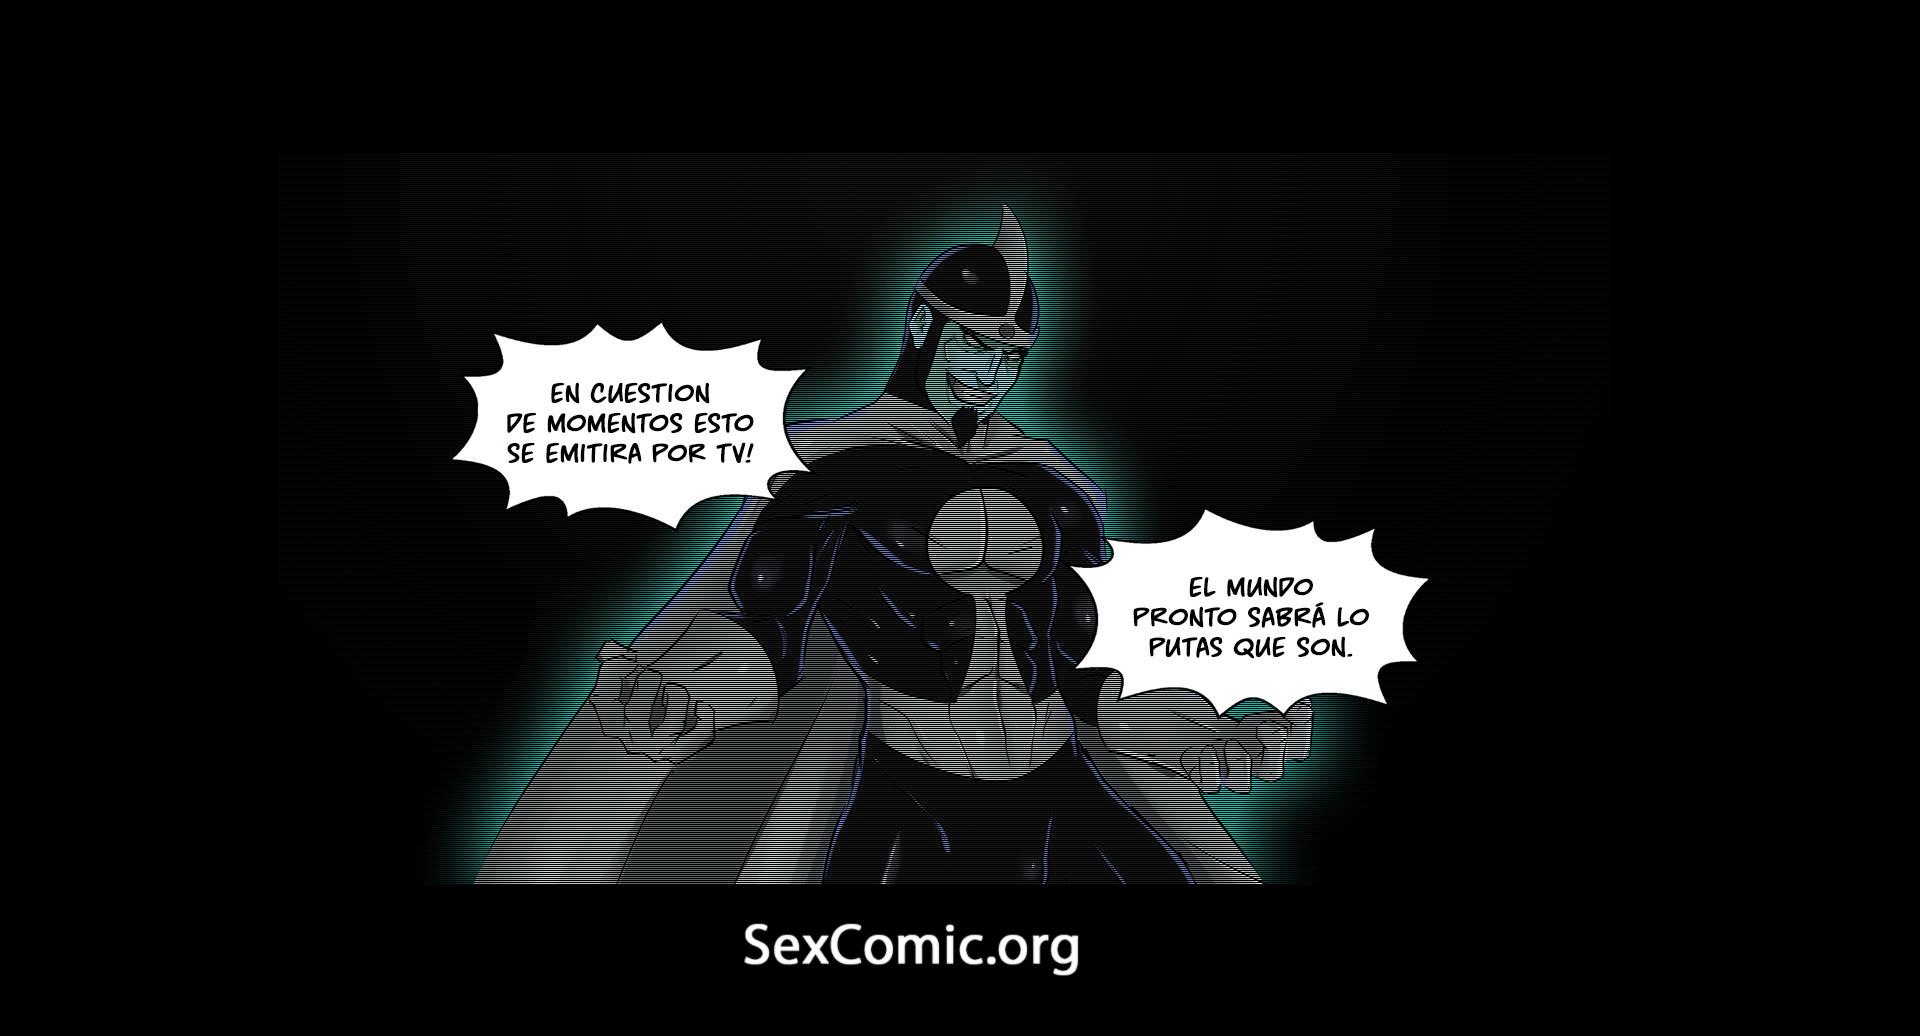 comic-xxx-super-heroes-marvel-historias-eroticas-mangas-sexuales-hentai-videos-pono-comics-de-incesto-gratis-13